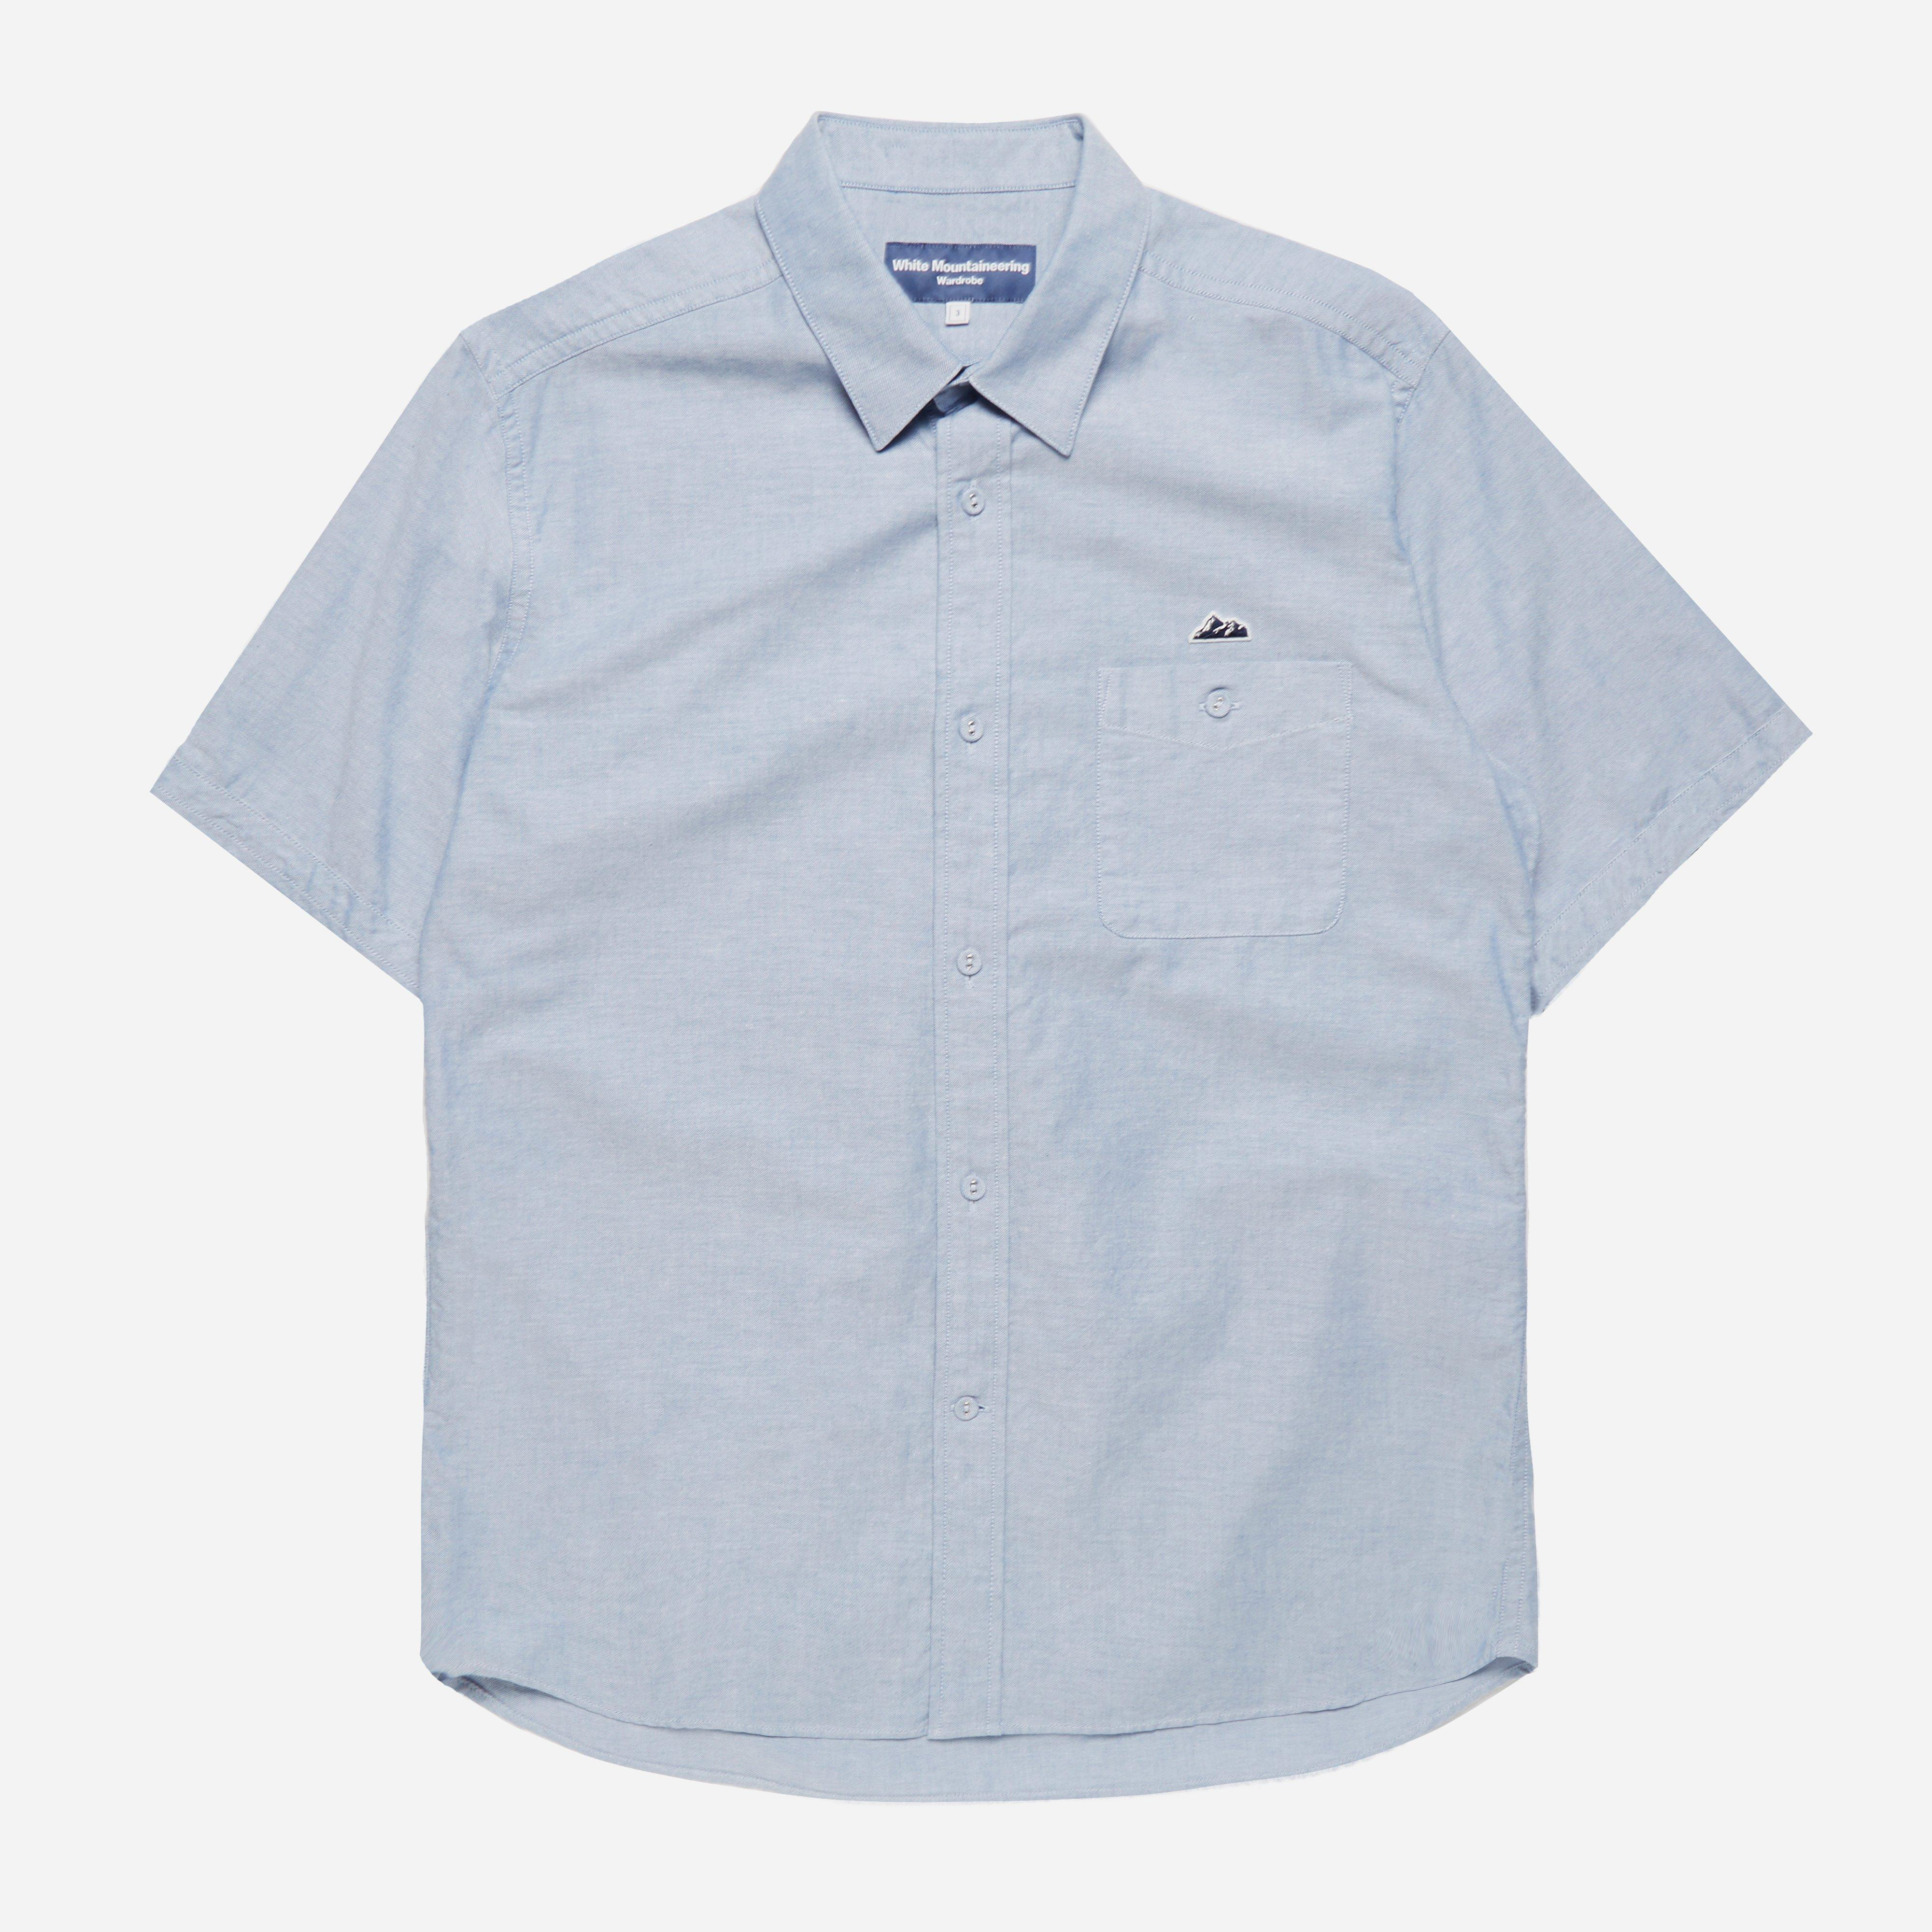 White Mountaineering Oxford Half Sleeve Shirt